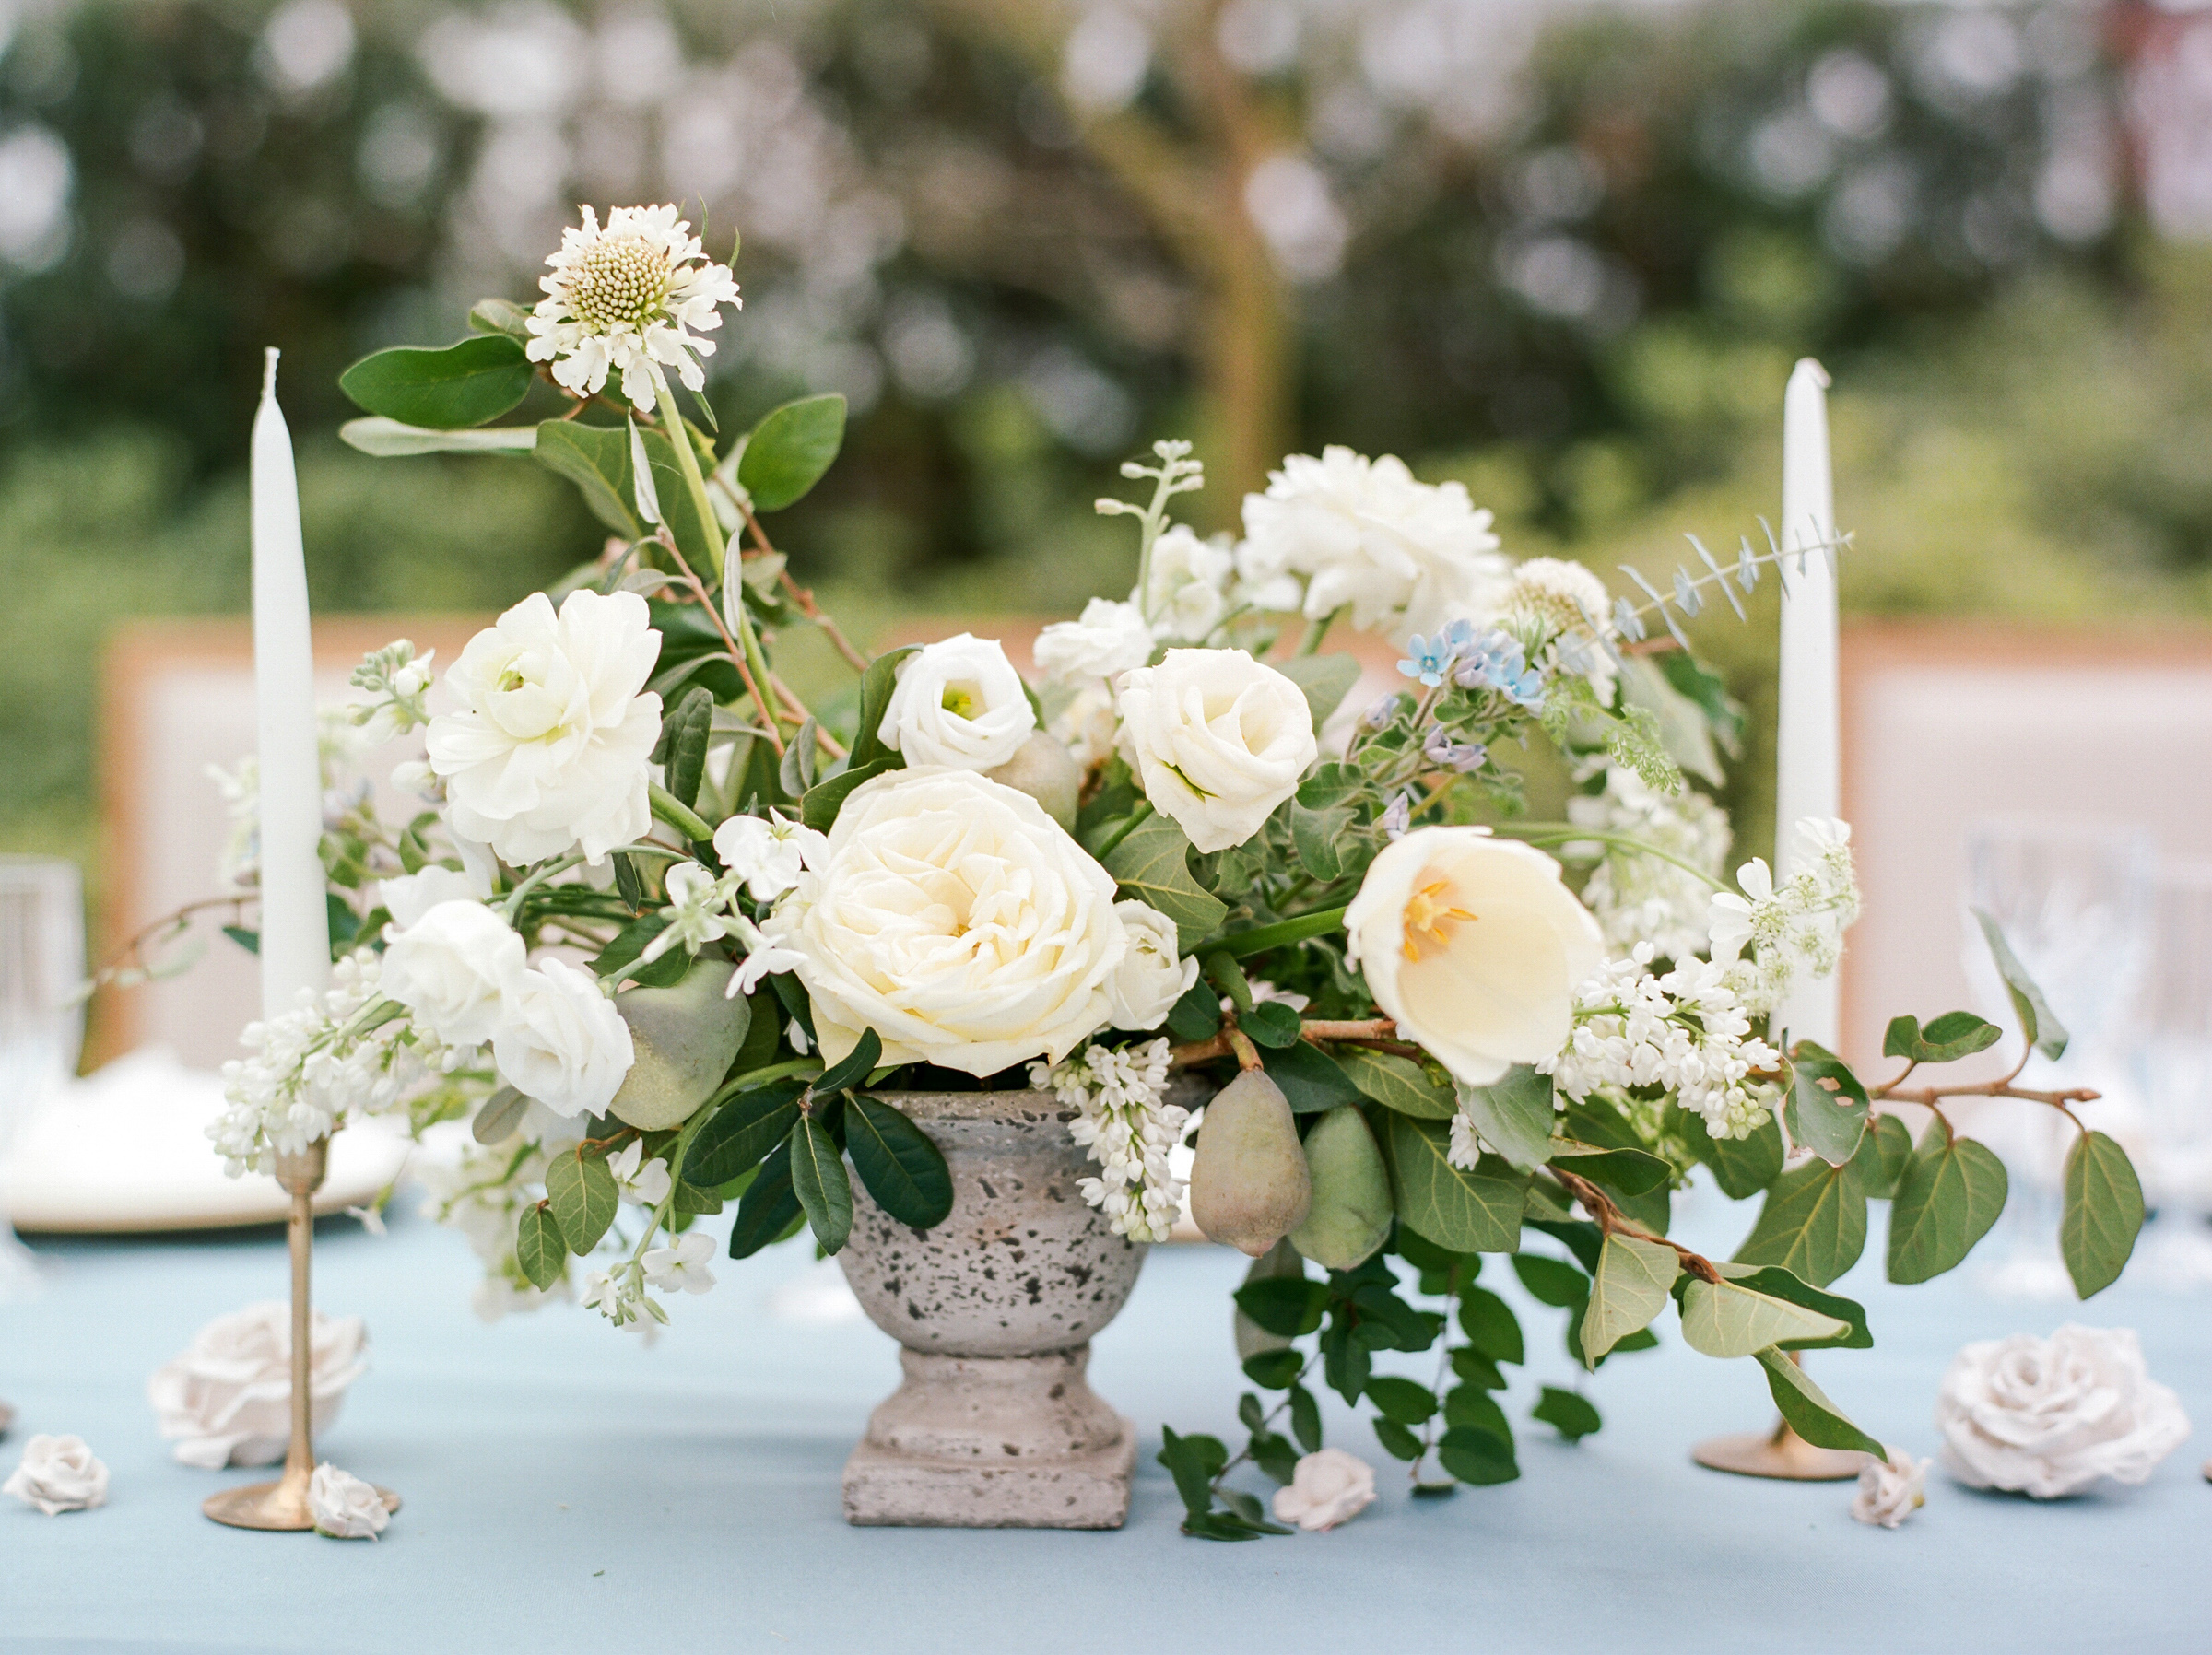 McGovern-Centennial-Gardens-Houston-Texas-Wedding-Venue-Josh-Dana-Fernandez-Photography-Film-Destination-Fine-Art-Luxury-Top-Best-Austin-Dallas-Magnolia-Rouge-Jennifer-Laura-Design-11.jpg